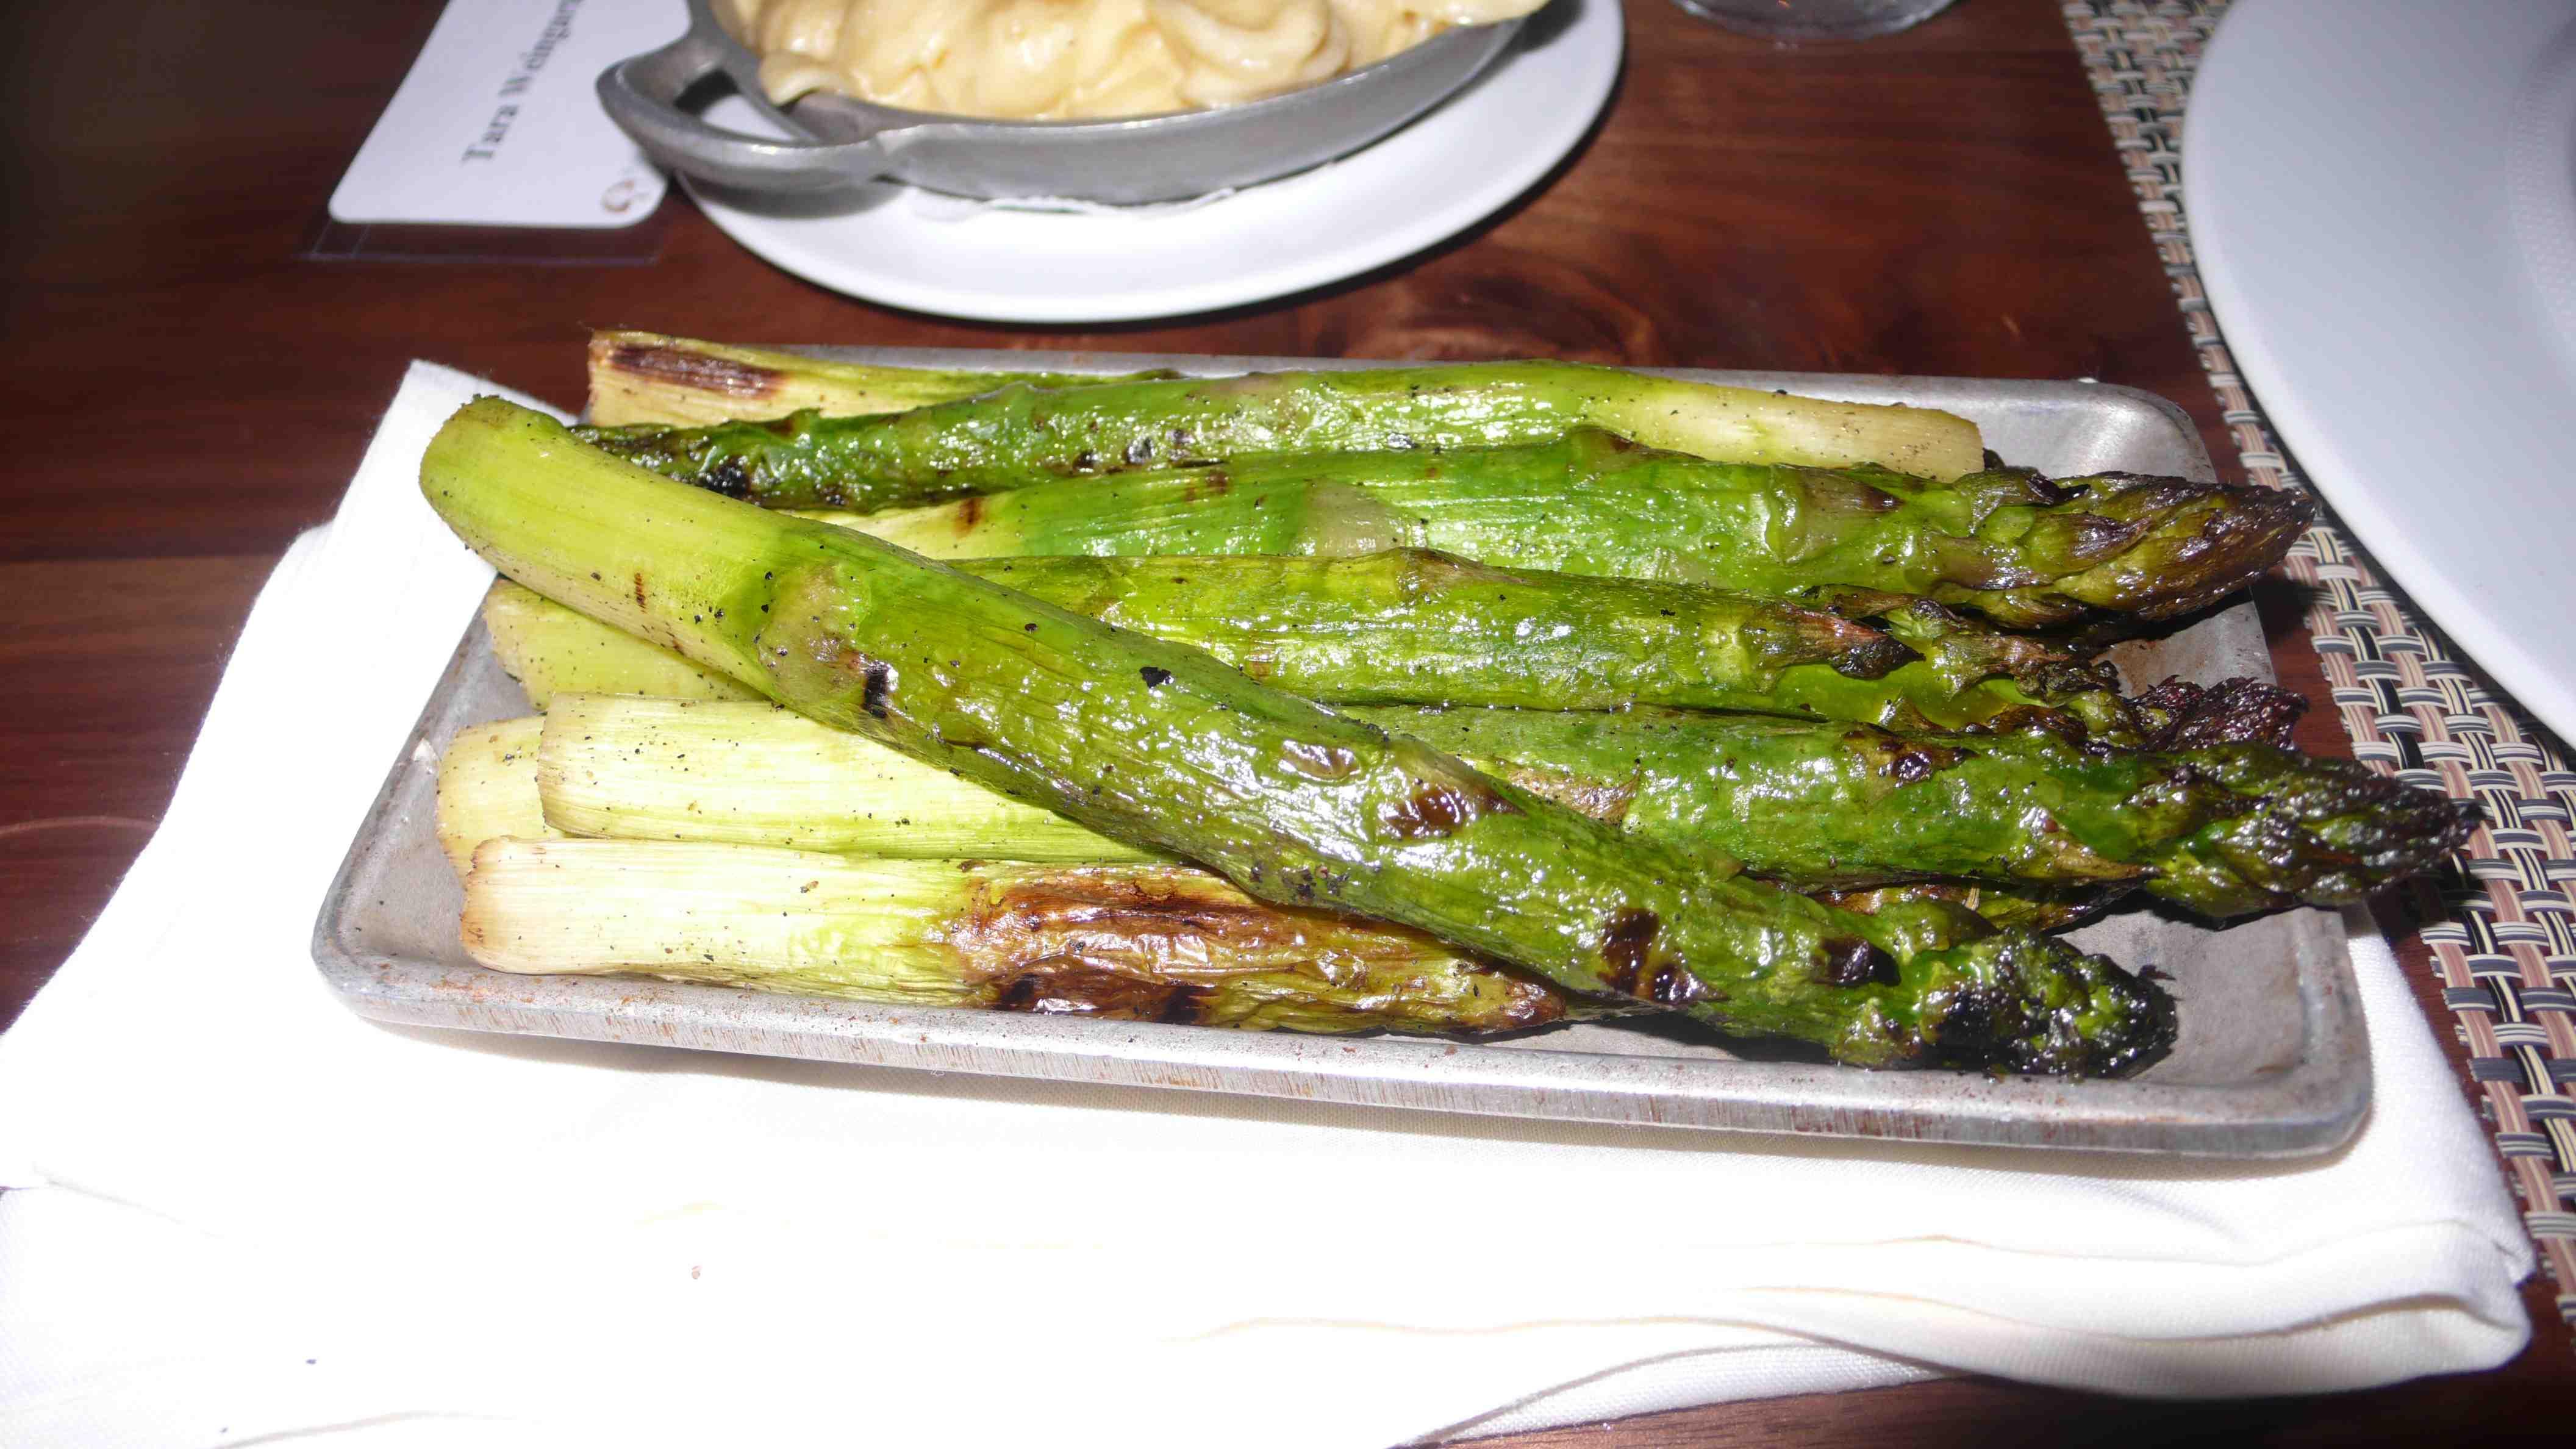 Grilled jumbo asparagus